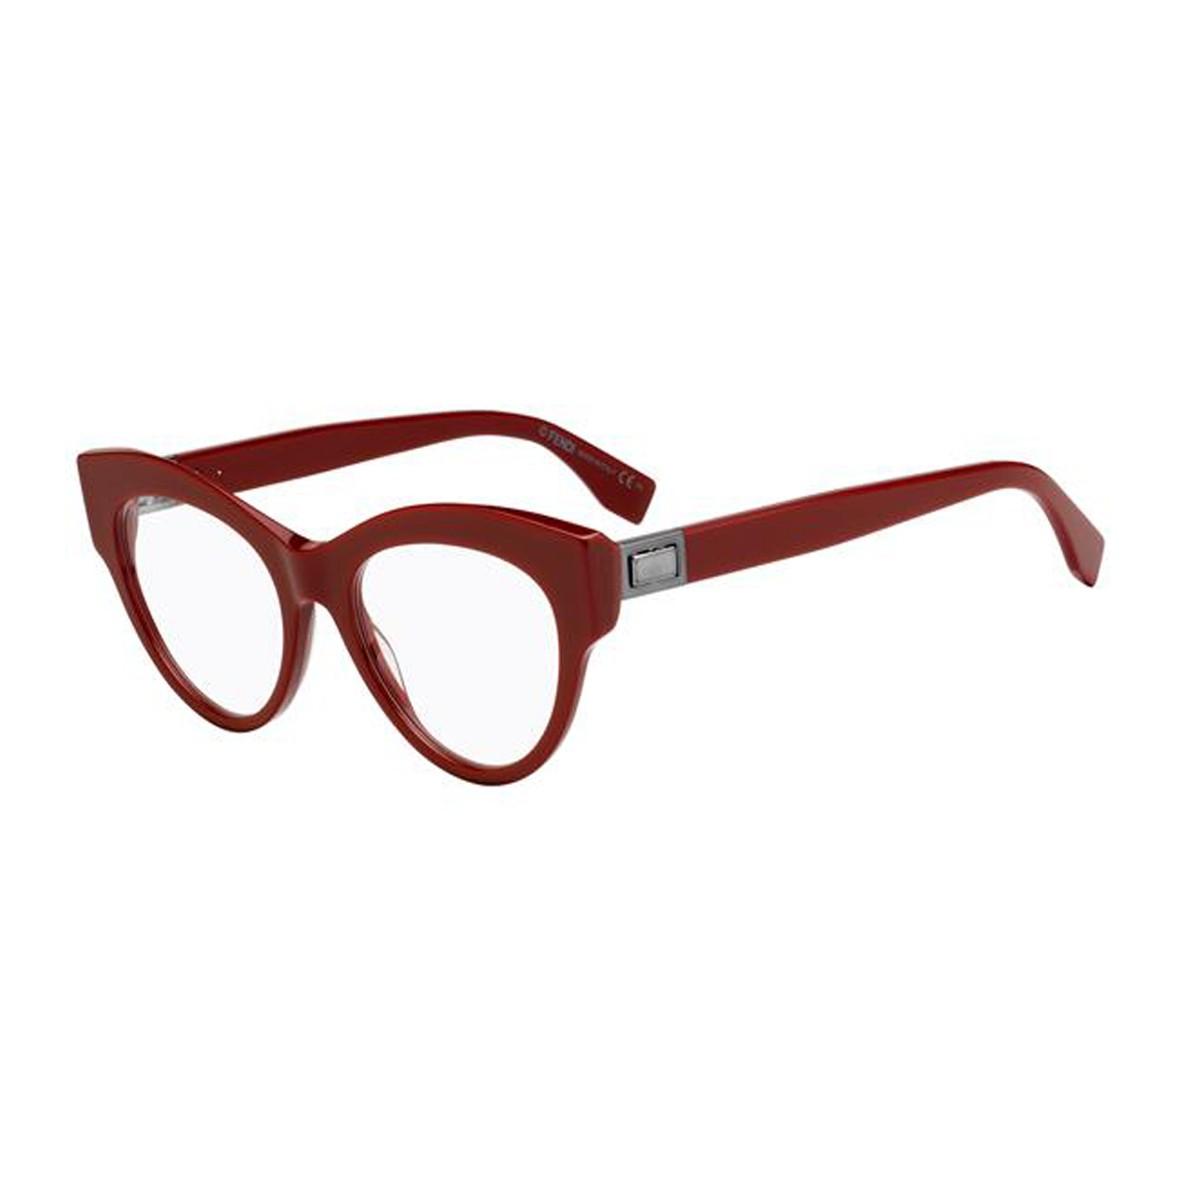 Fendi FF 0273 | Women's eyeglasses